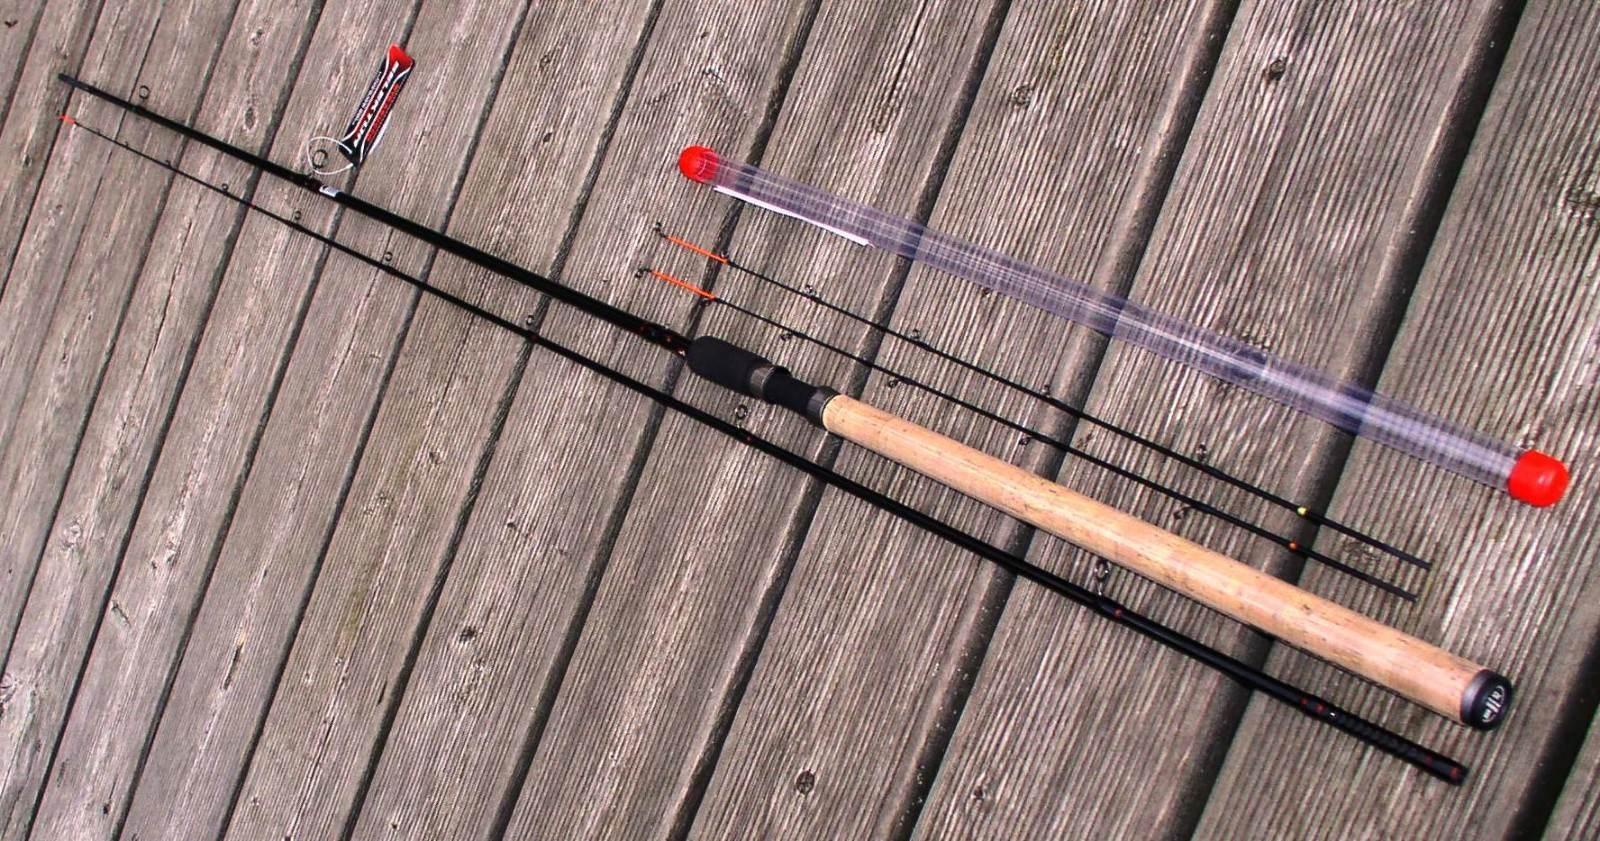 Trabucco Method-Feeder Rute 3,00 oder 3,30 Meter Selektor XS, Feederute, Feeder